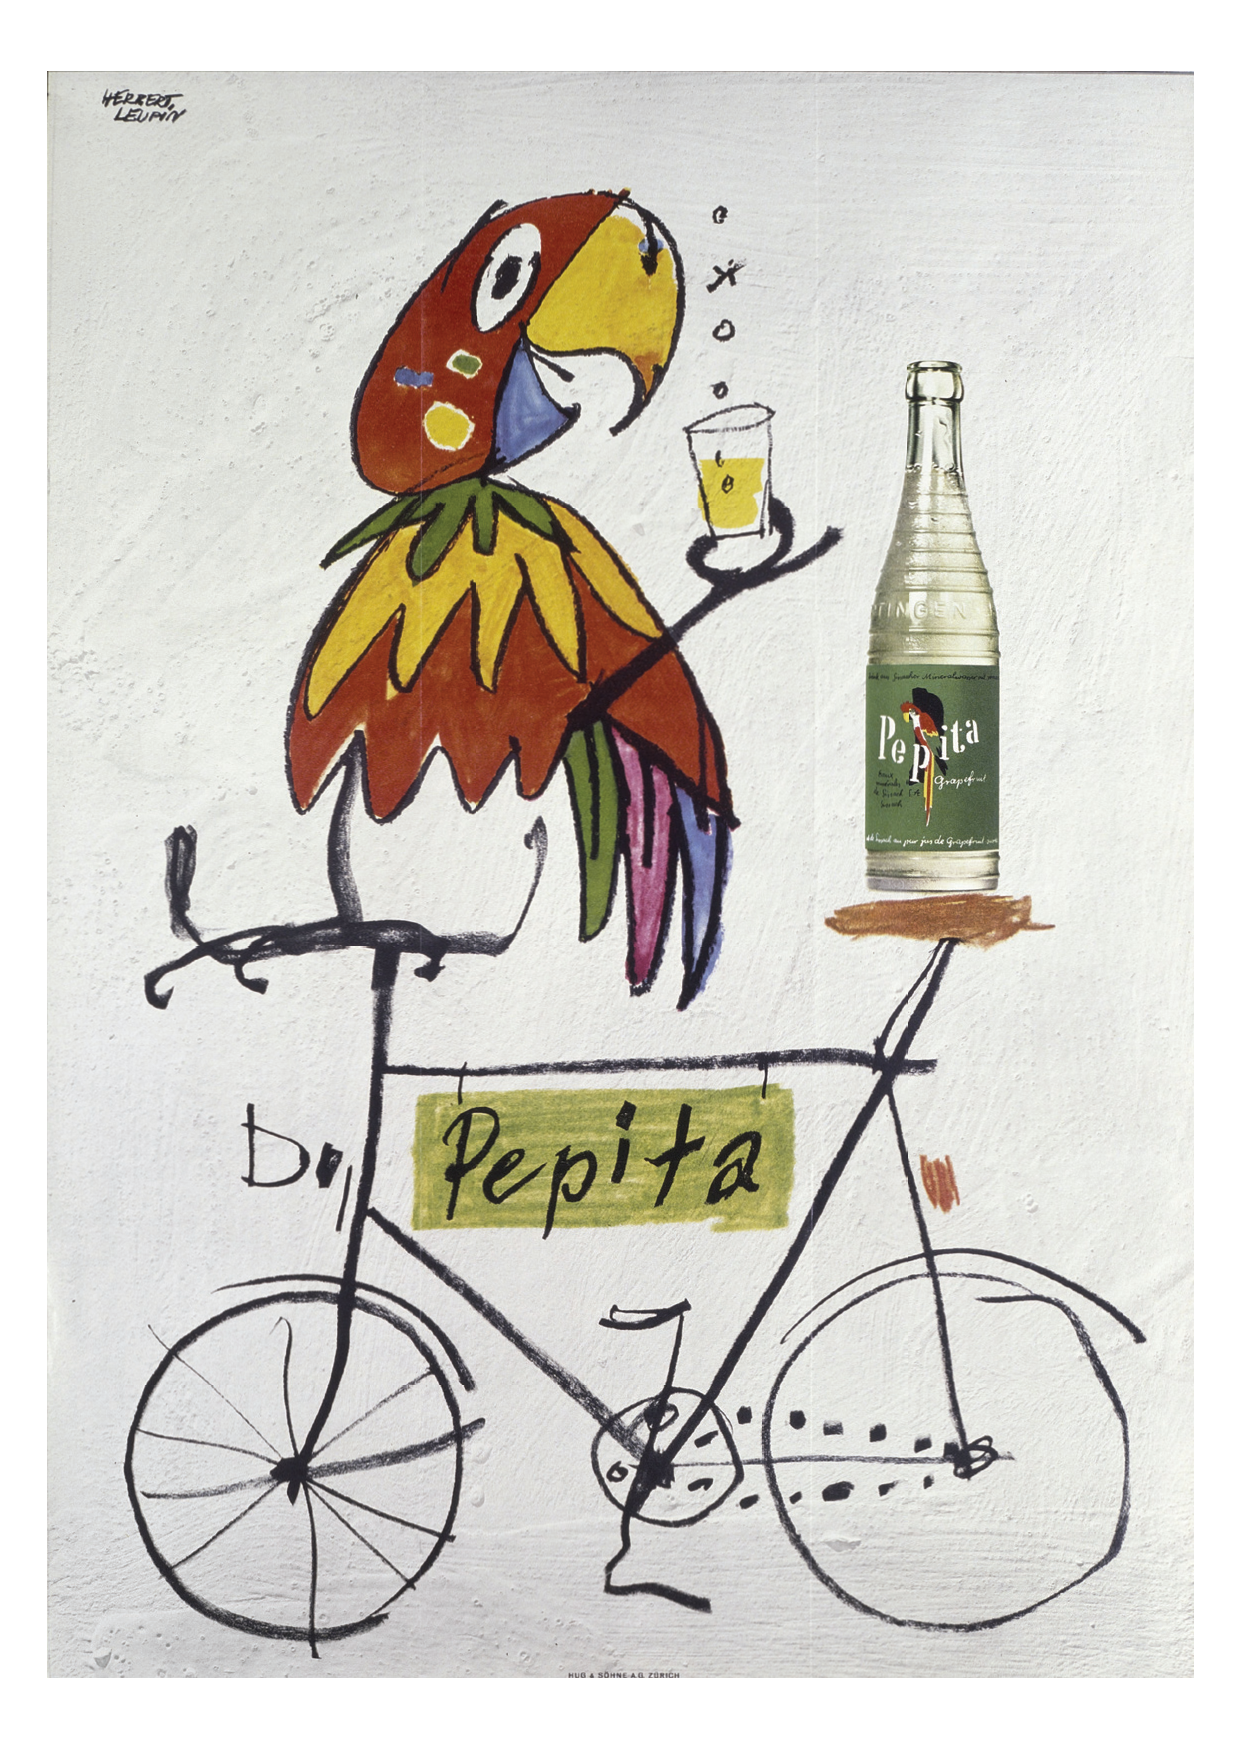 Herbert Leupin Pepita Parrot Bike Poster